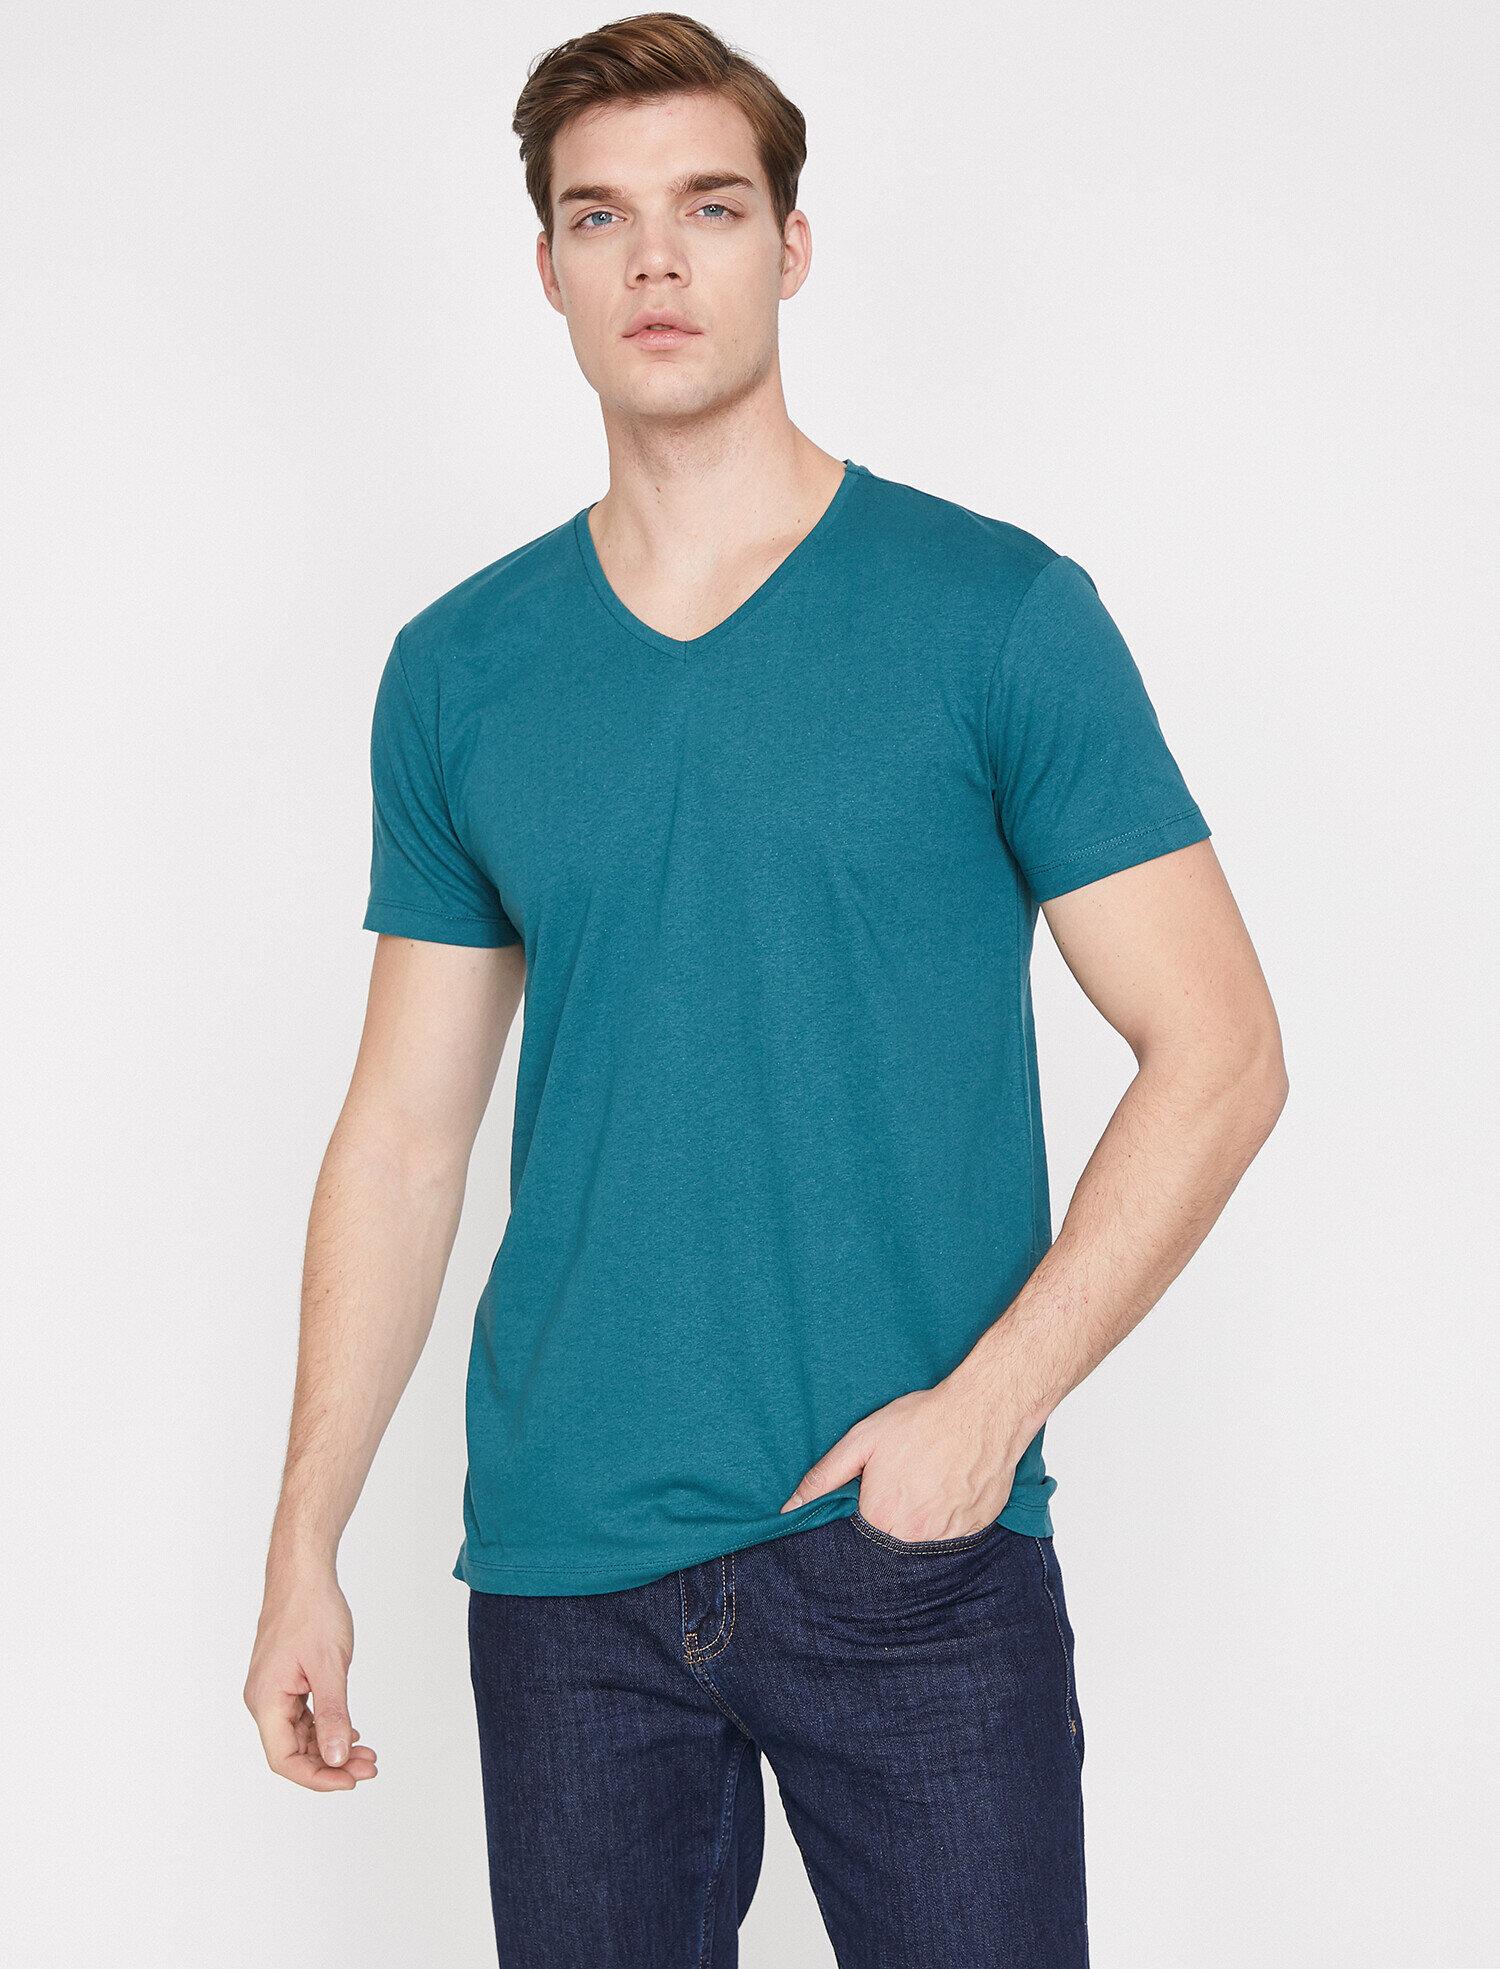 Koton Erkek V Yaka T-Shirt Yeşil Ürün Resmi